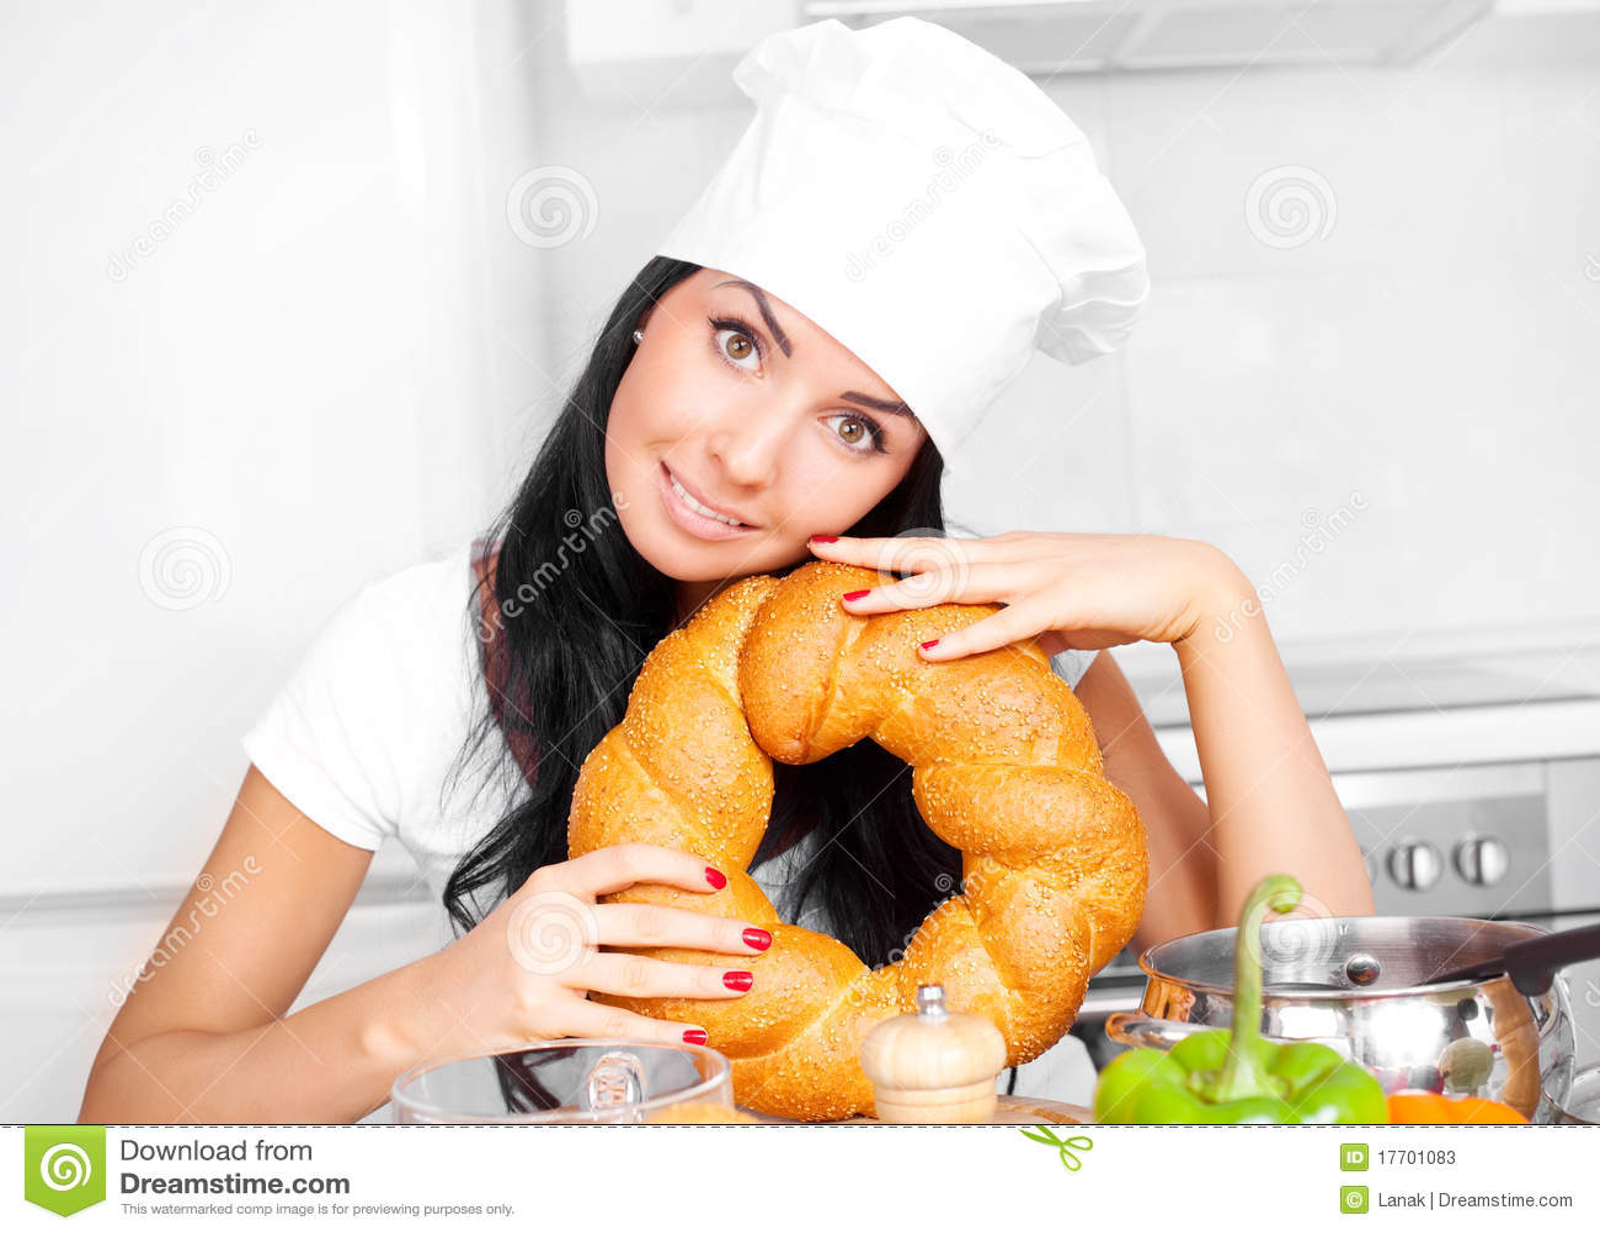 Cuisinier avec du pain photos stock image 17701083 for Cuisinier 2010